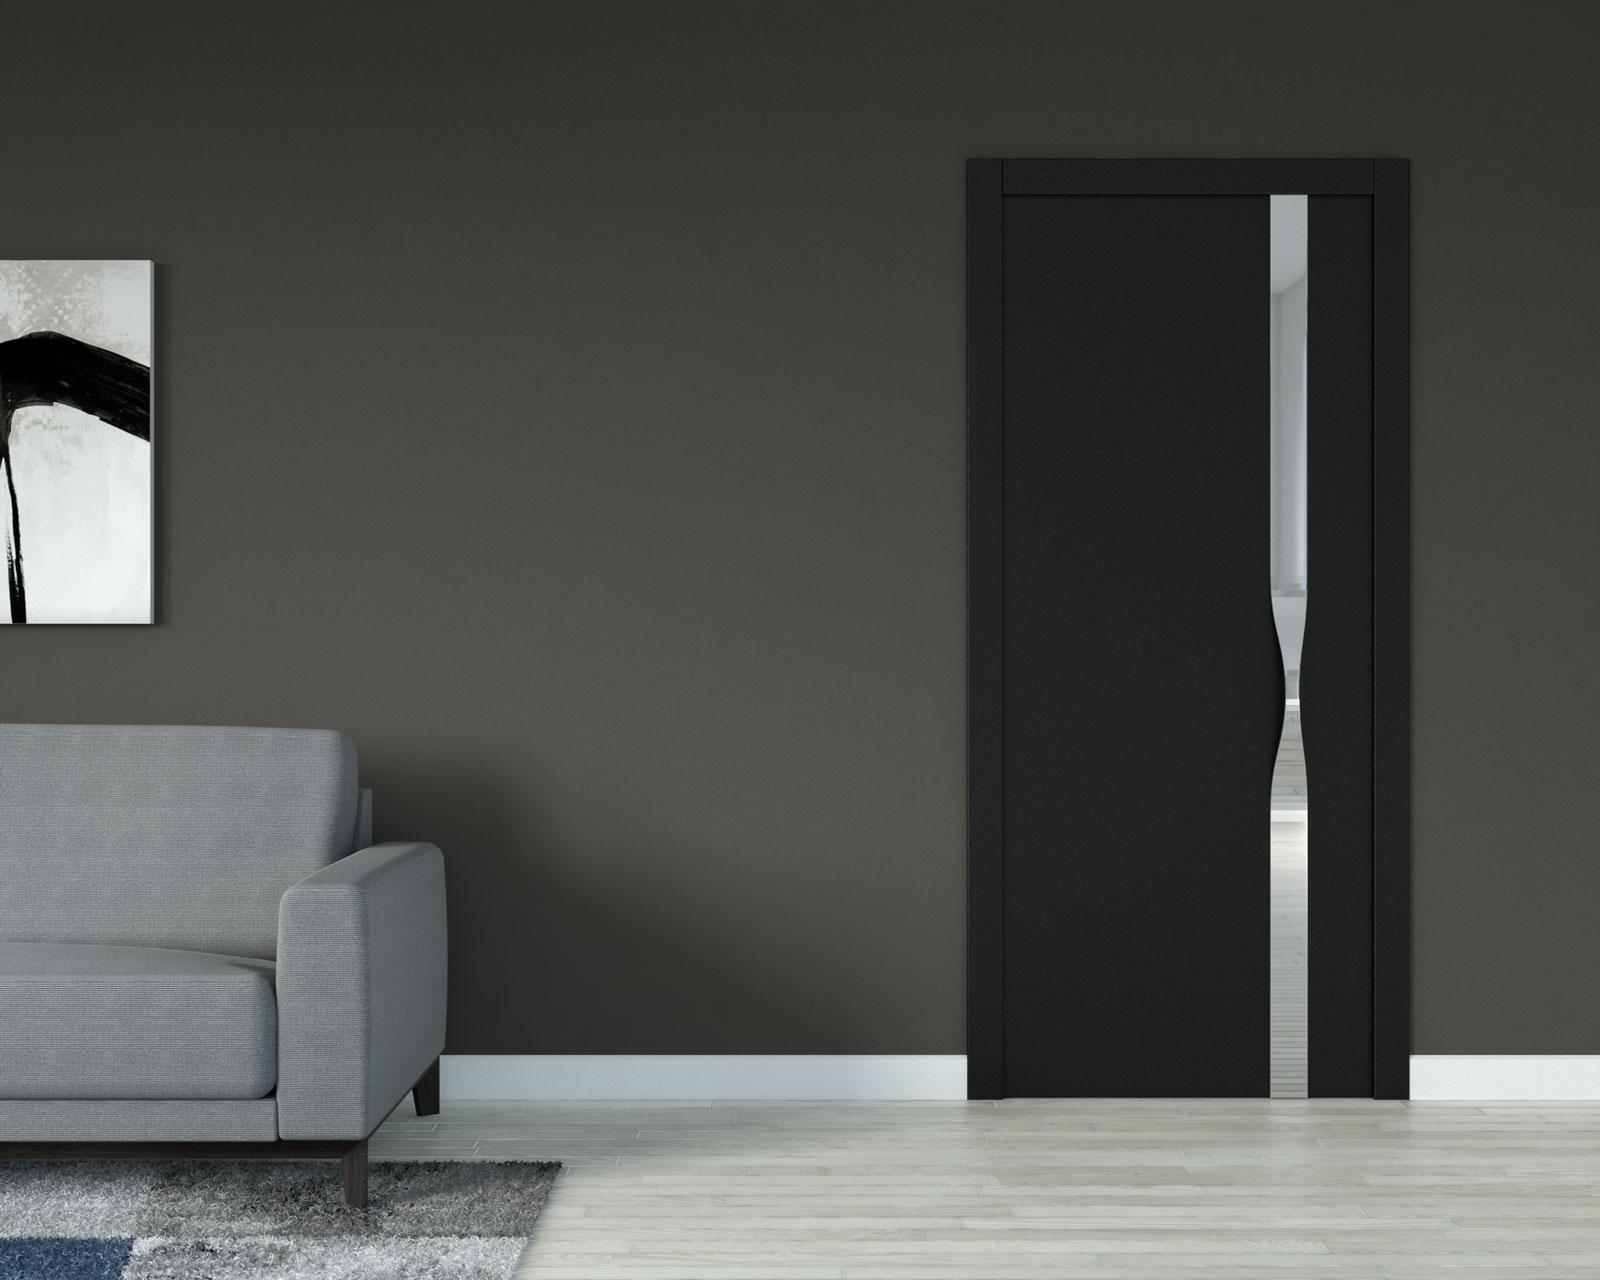 Urbane bronze wall with black interior doors